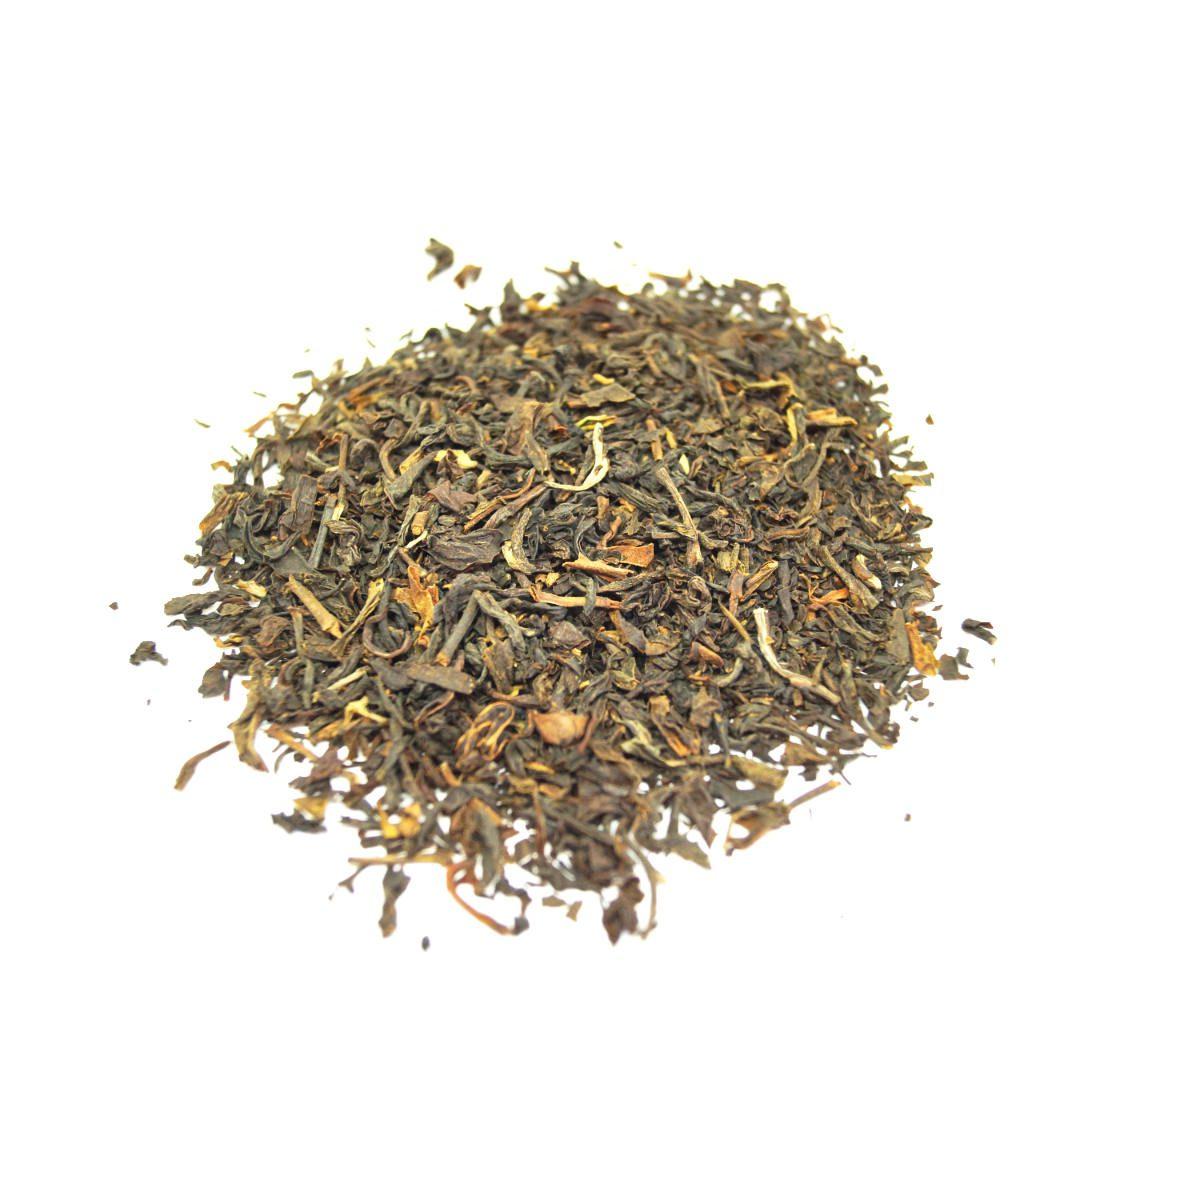 Blend of Black Teas of India combining tastes with small leaves and full bodied colour and taste Darjeeling – Makaibari FTGFOP1, Nilgiri – Thiashola - SFTGFOP1, China – Keemun, Assam – India TGFOP